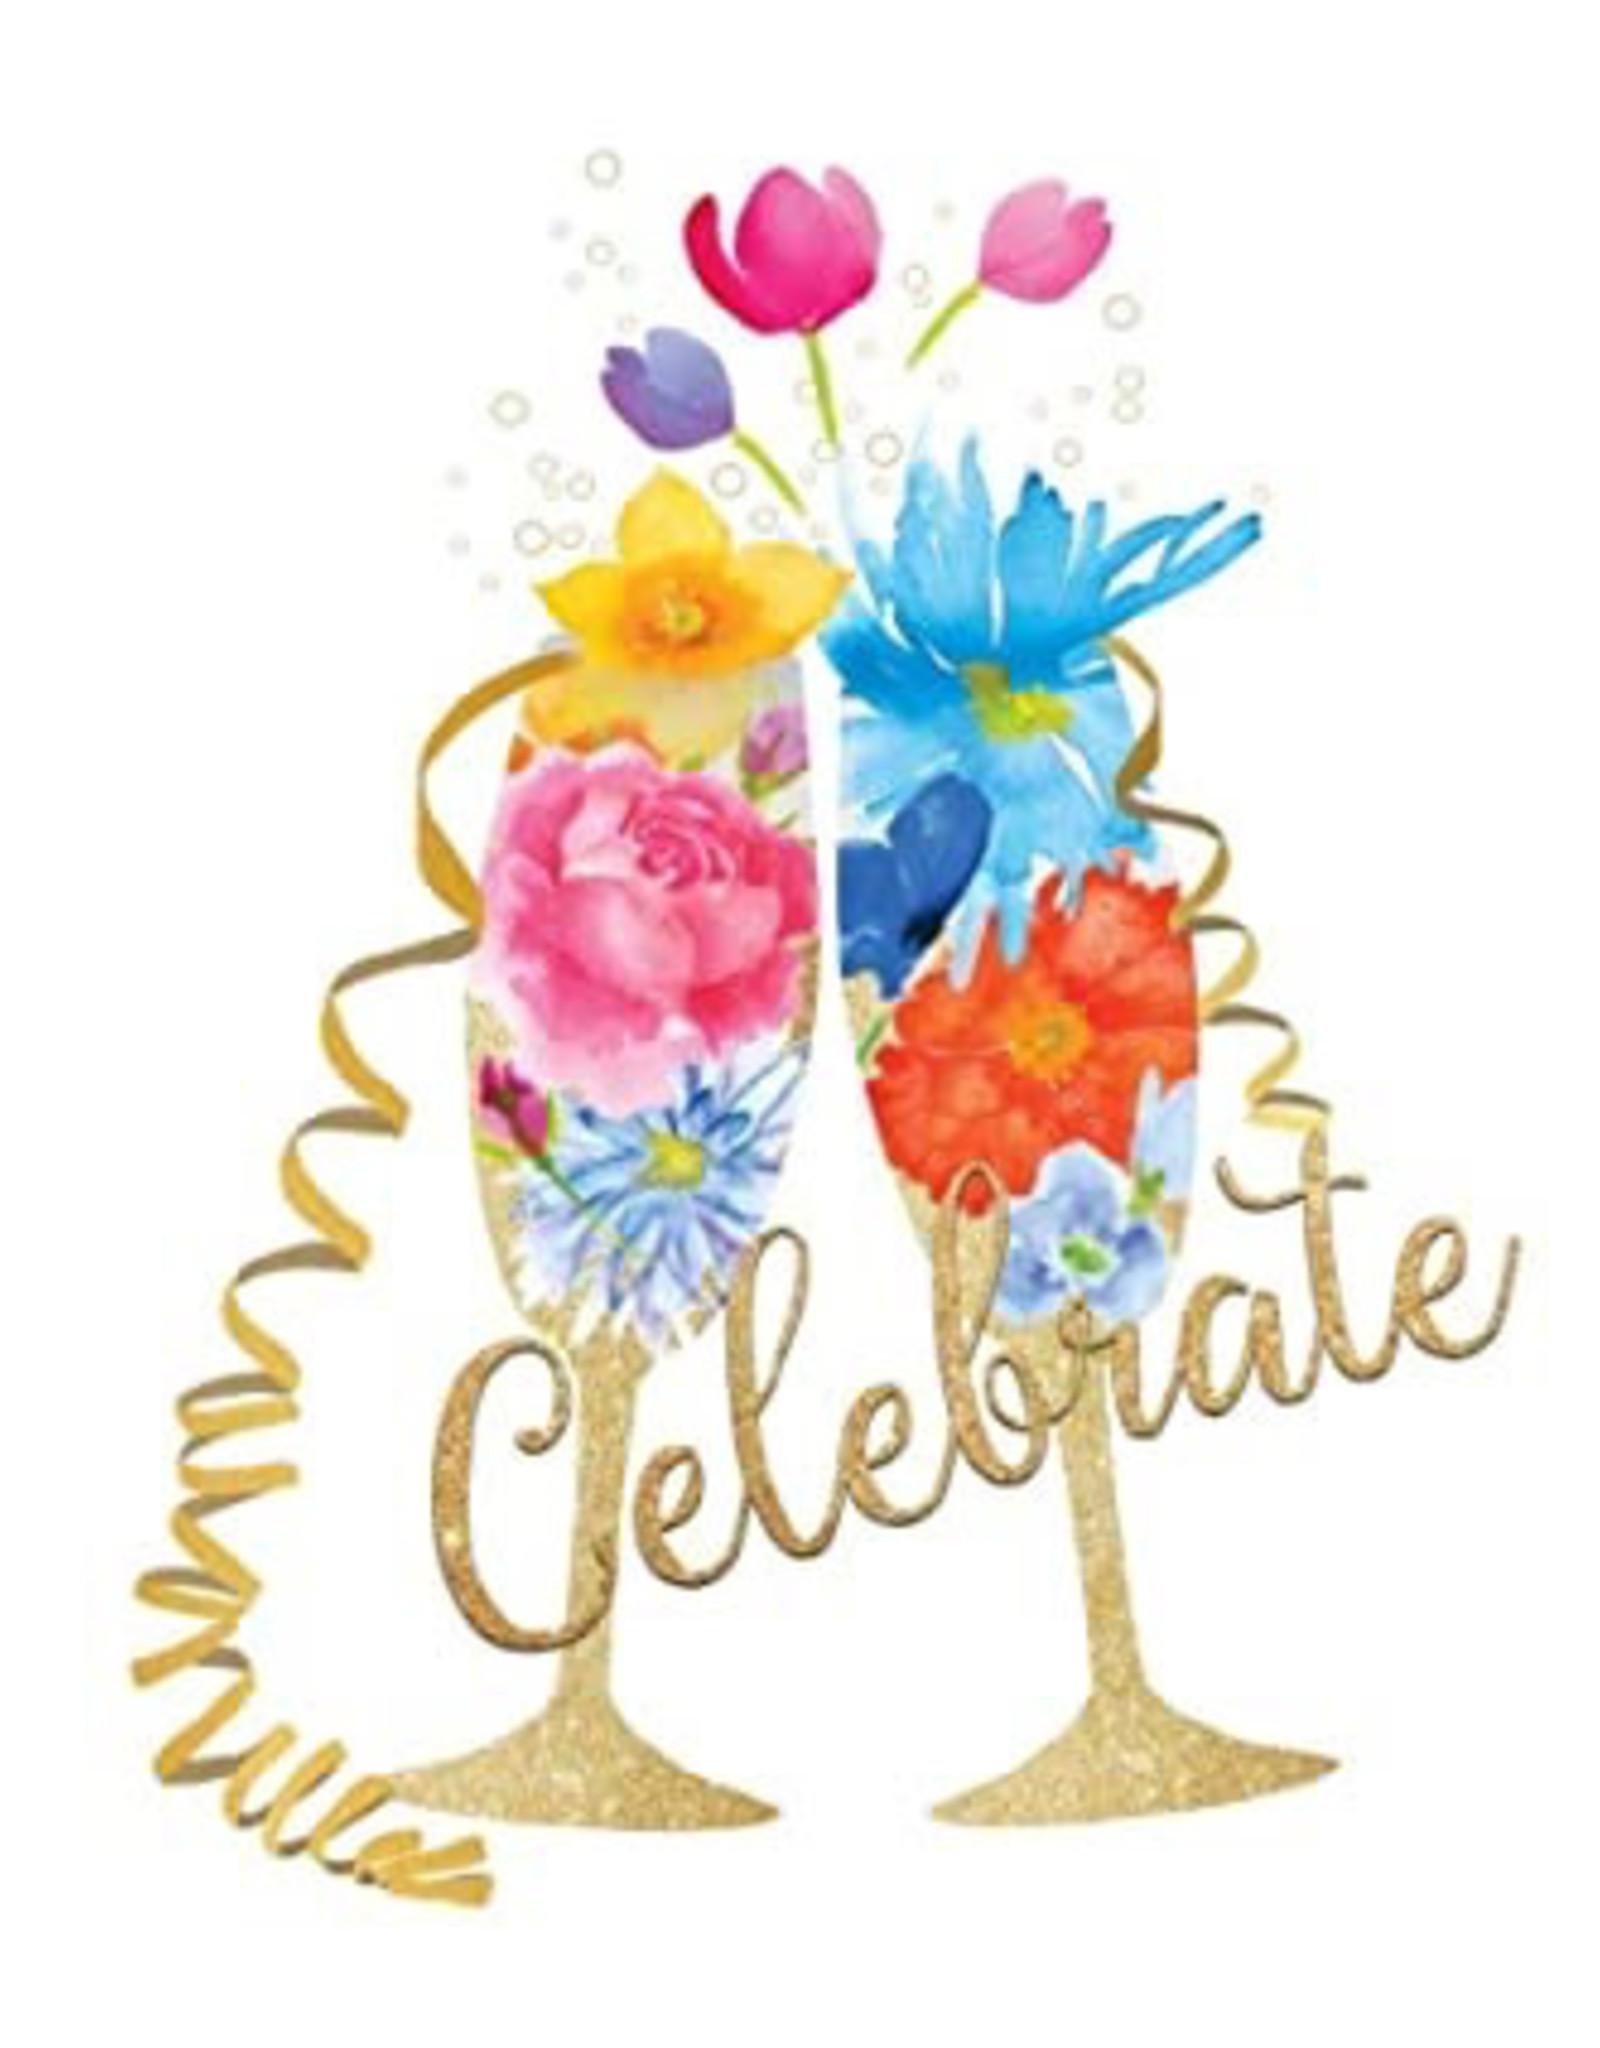 Celebrate Napkins